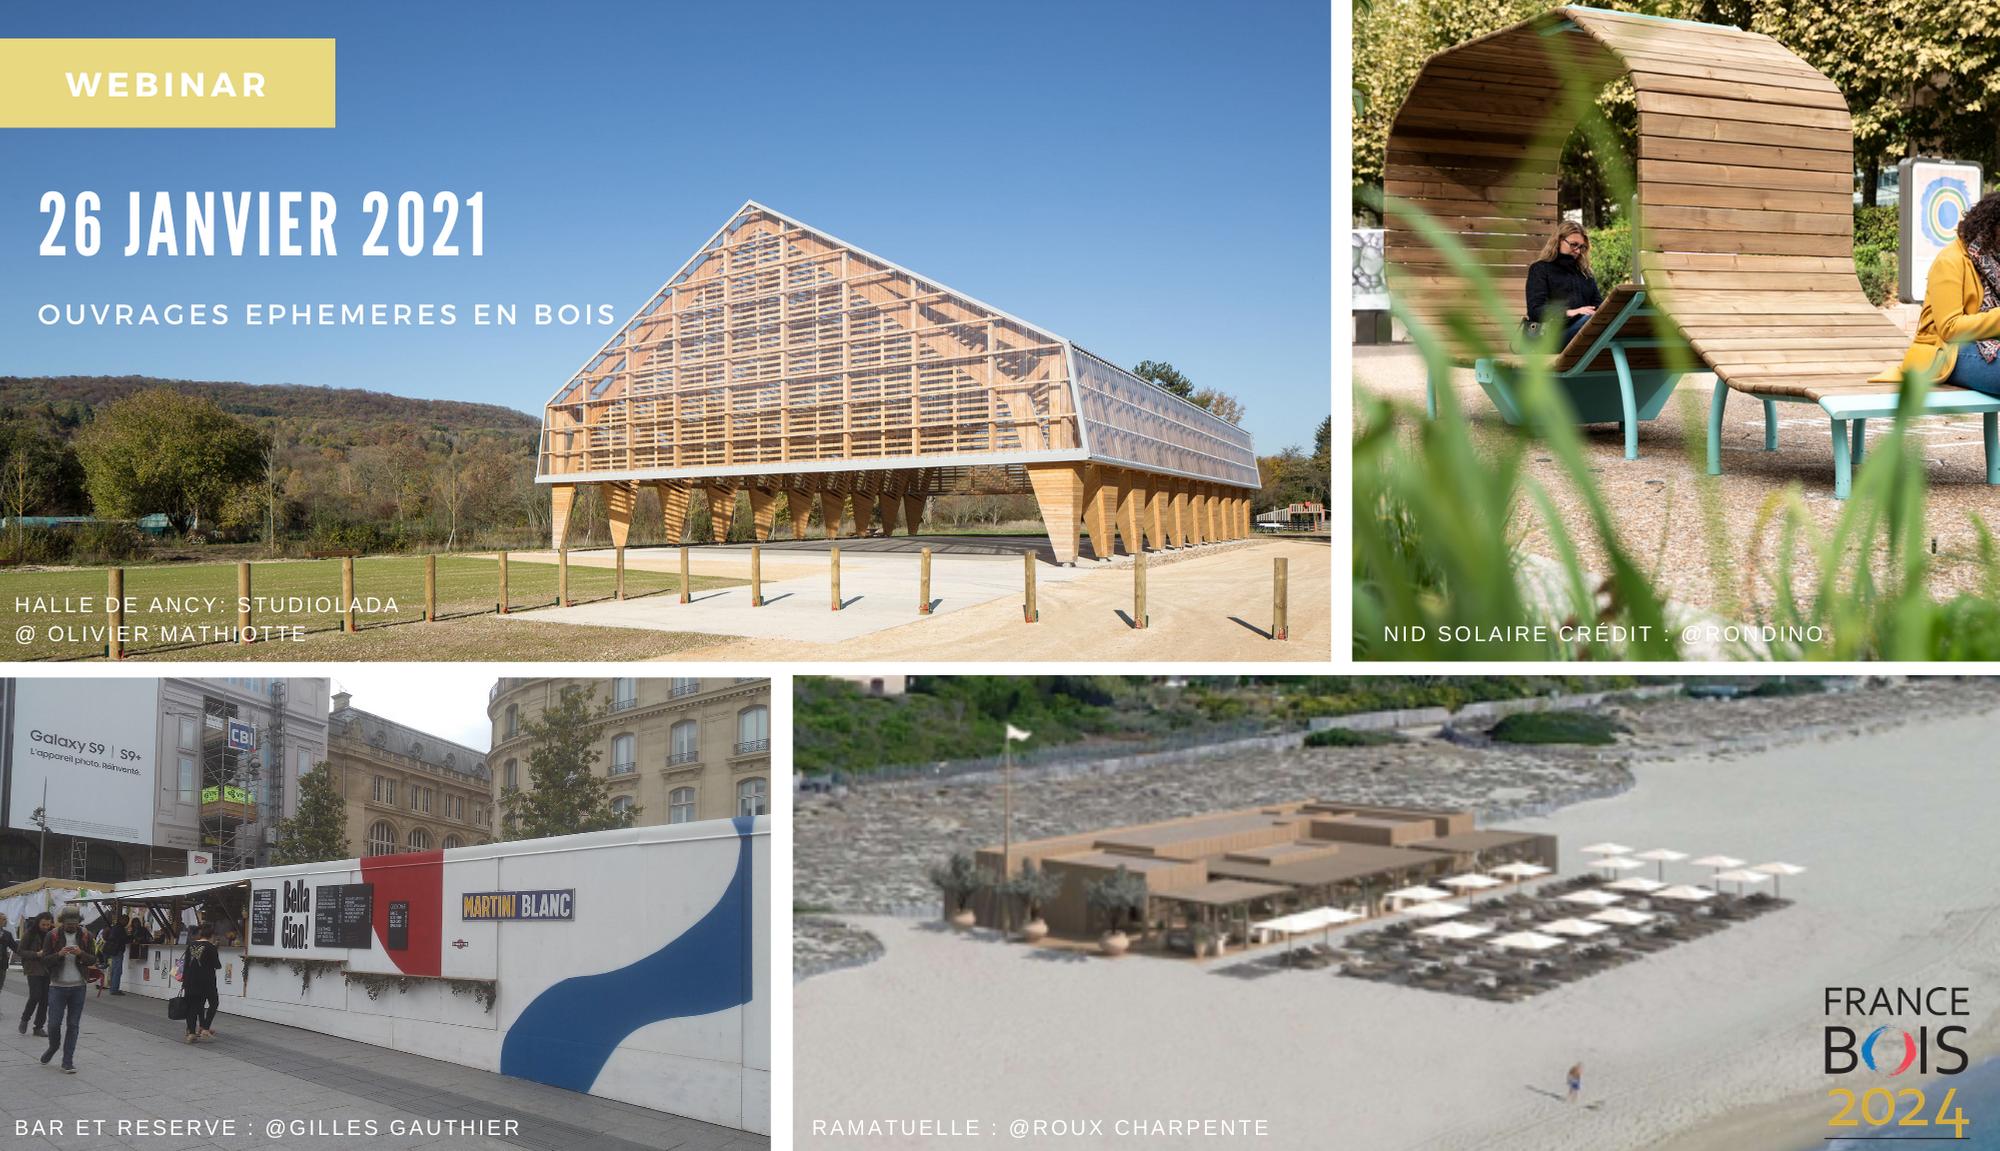 26 JANVIER 2021 webinar ouvrages éphémères en bois cndb FB2024